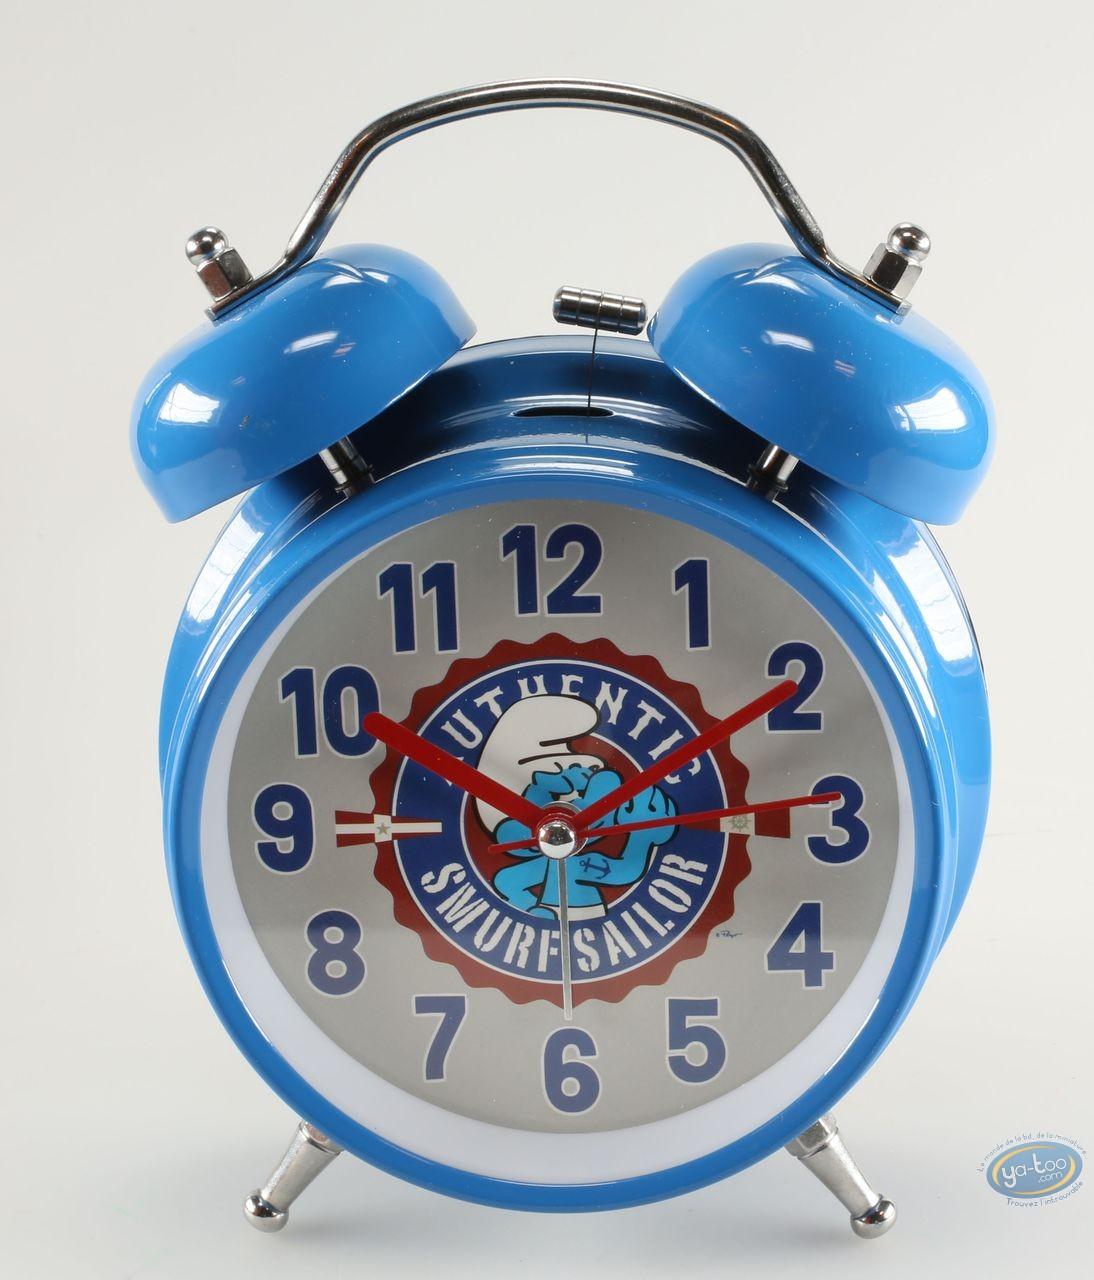 Clocks & Watches, Smurfs (The) : Alarm clock, Sailor Smurf Luminous Bleue